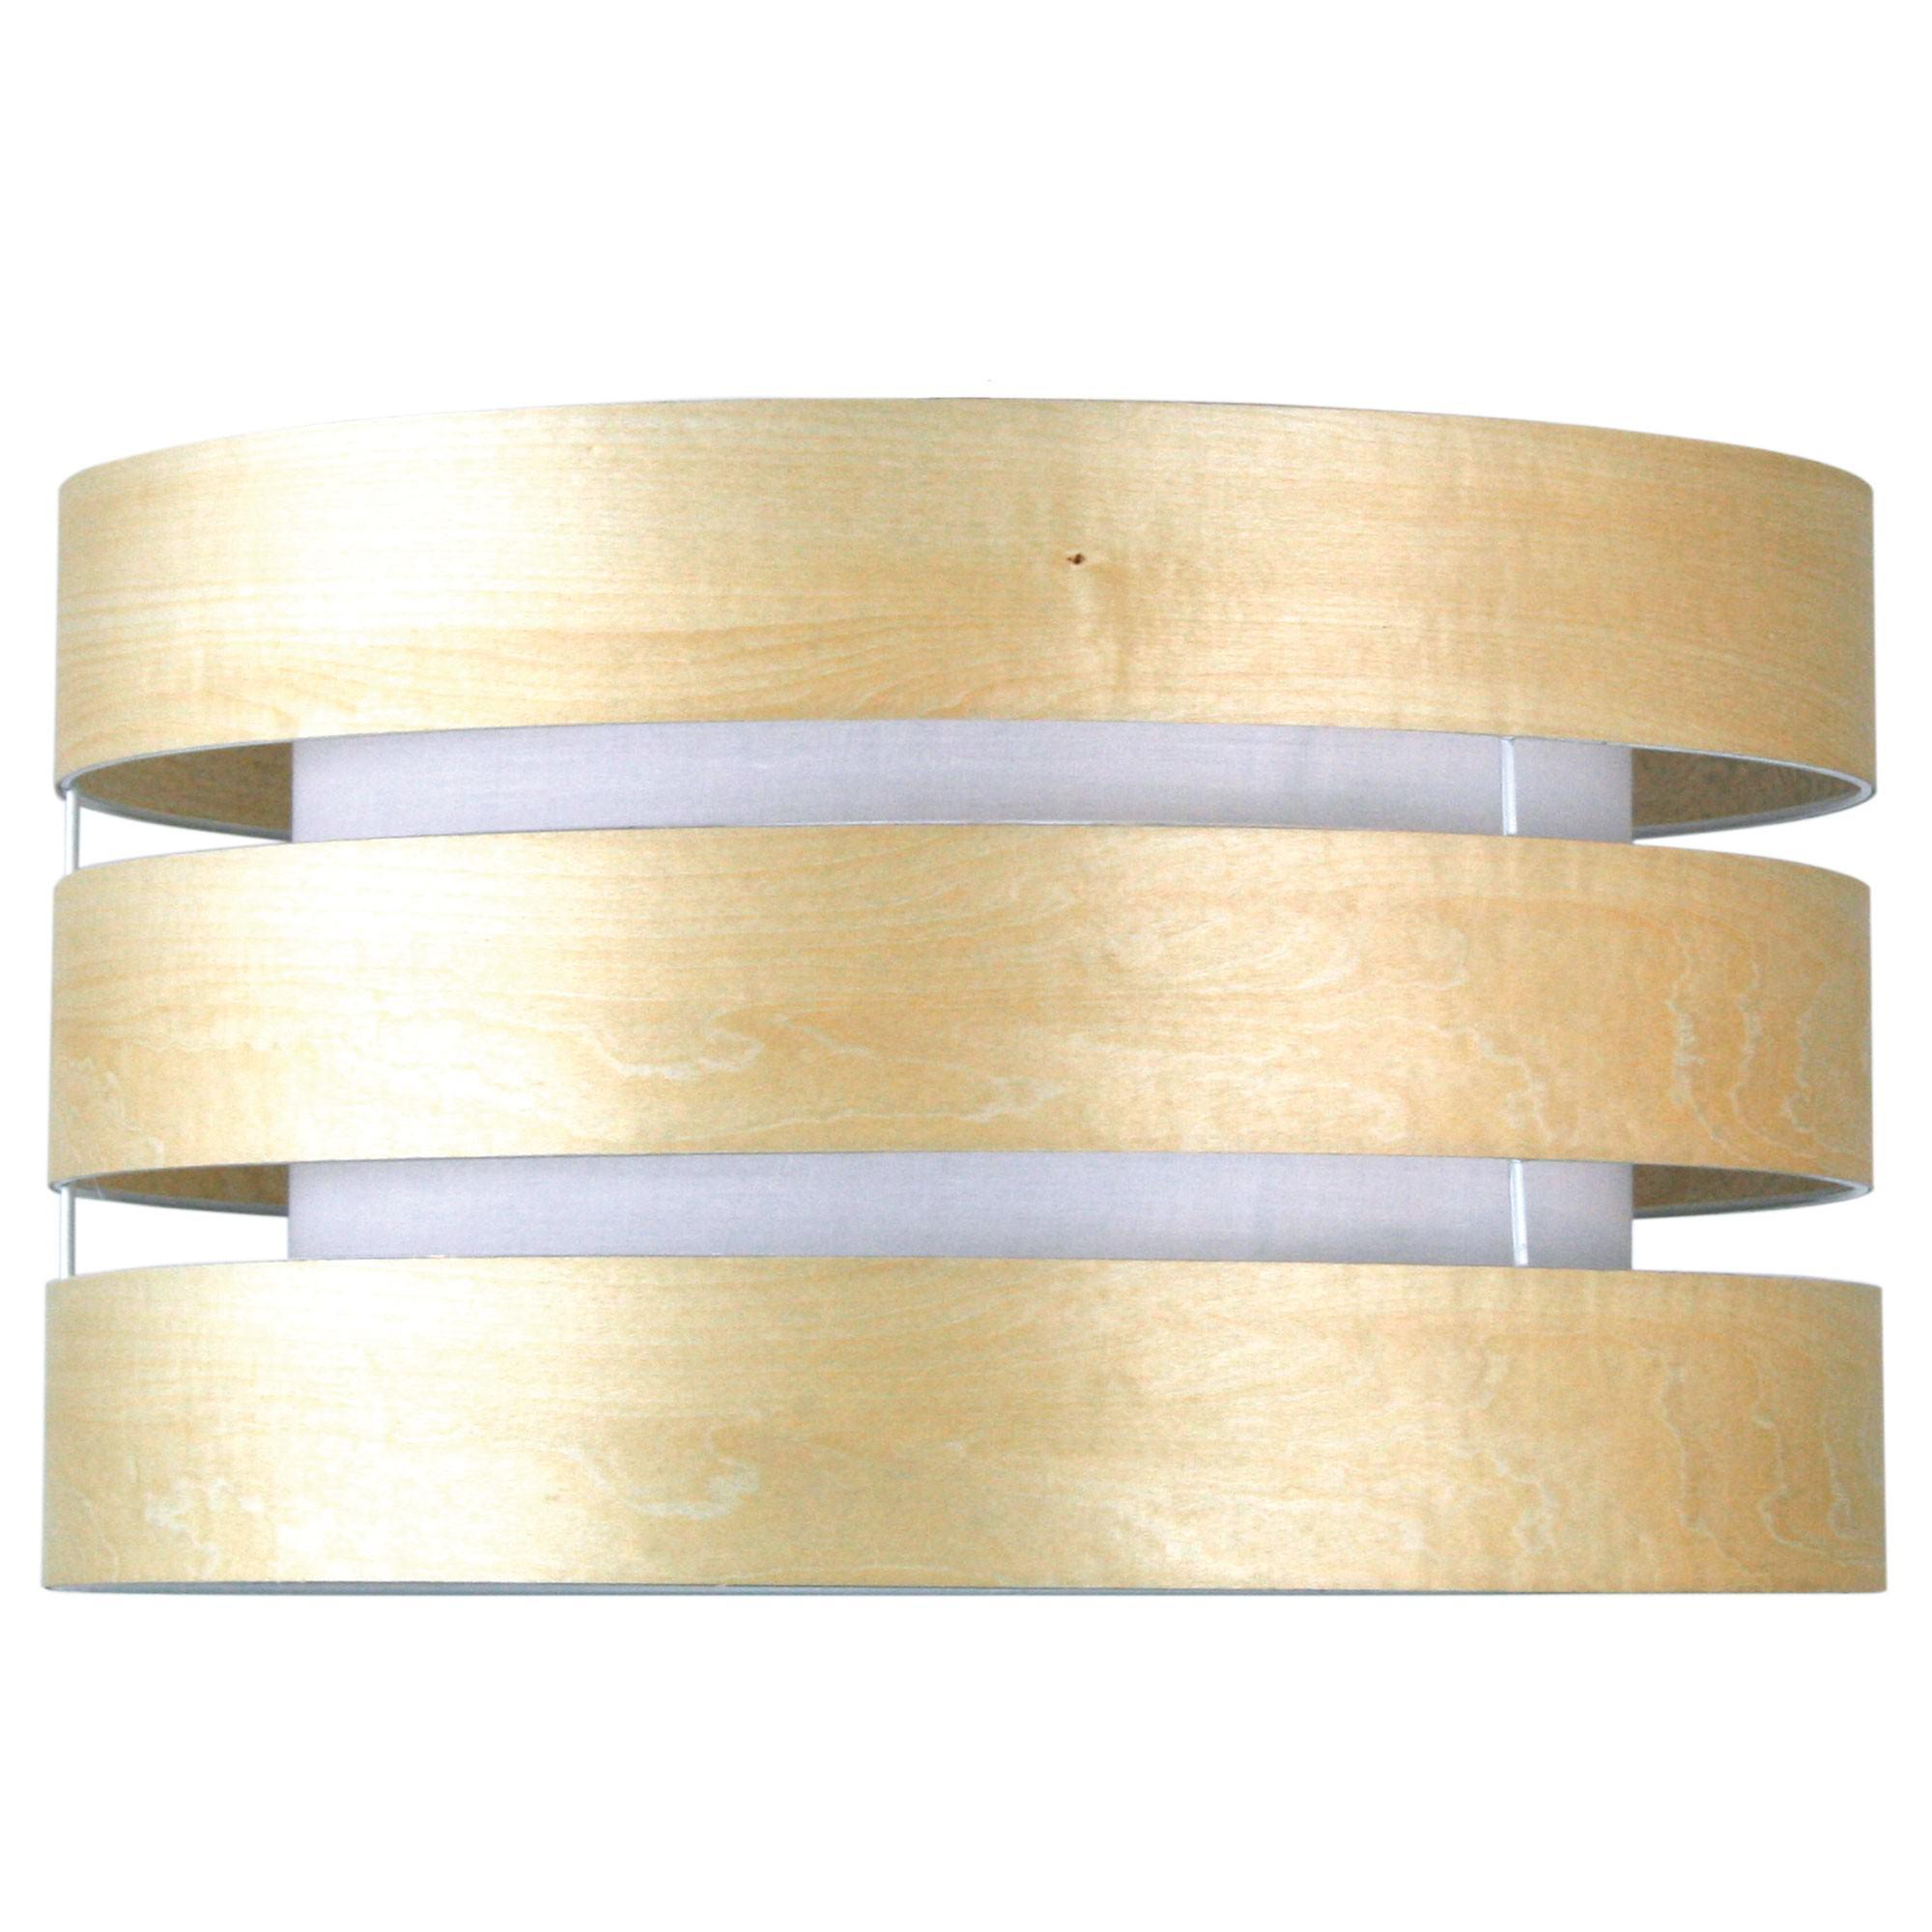 Taho Timber Slated Pendant Light Drum Shade, Beech